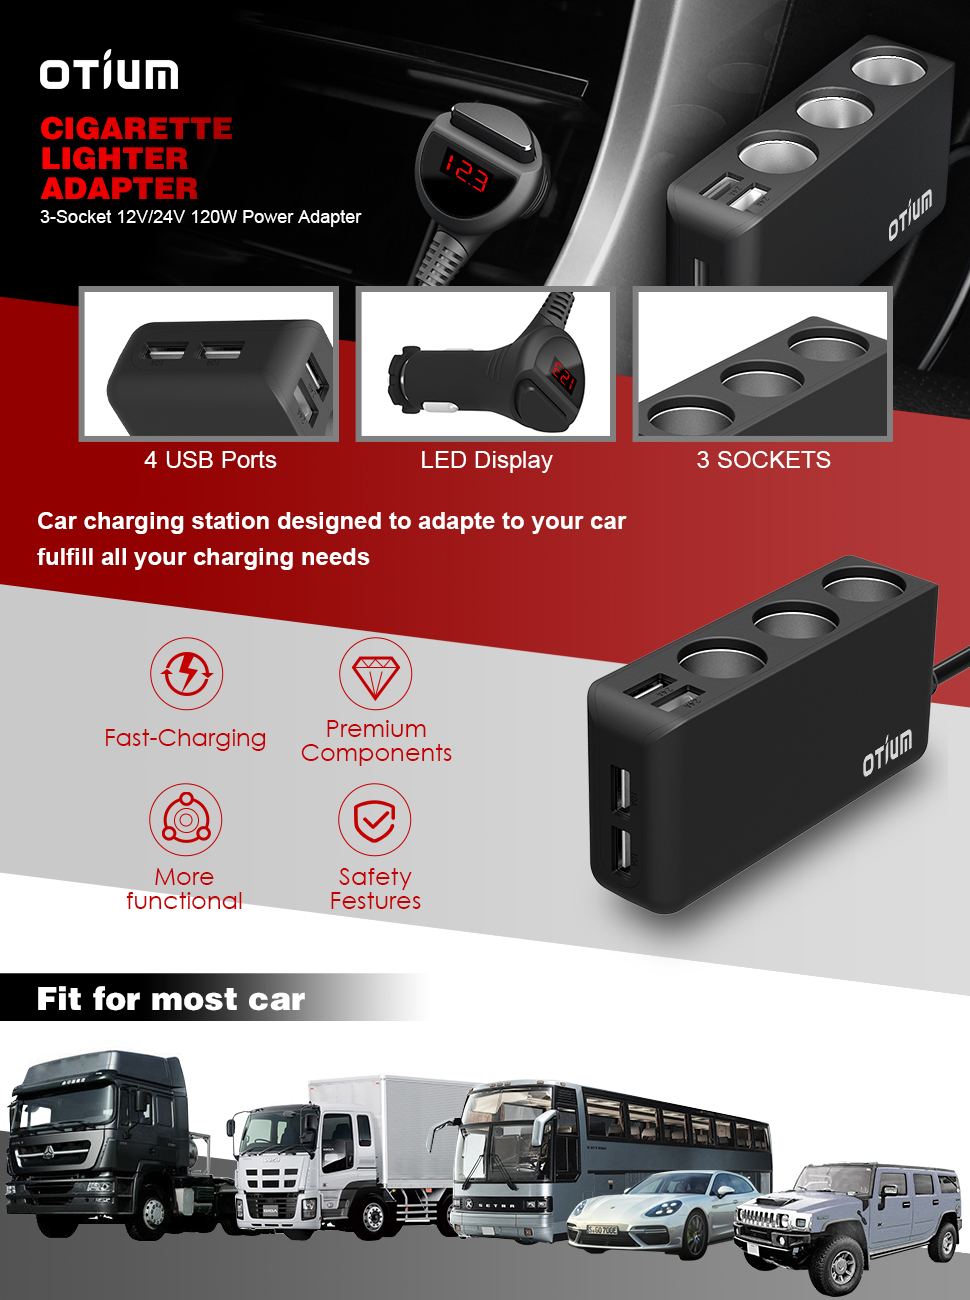 Otium Car Charger Adapter 3 Socket Cigarette Lighter Low Power Negative Supply Product Description